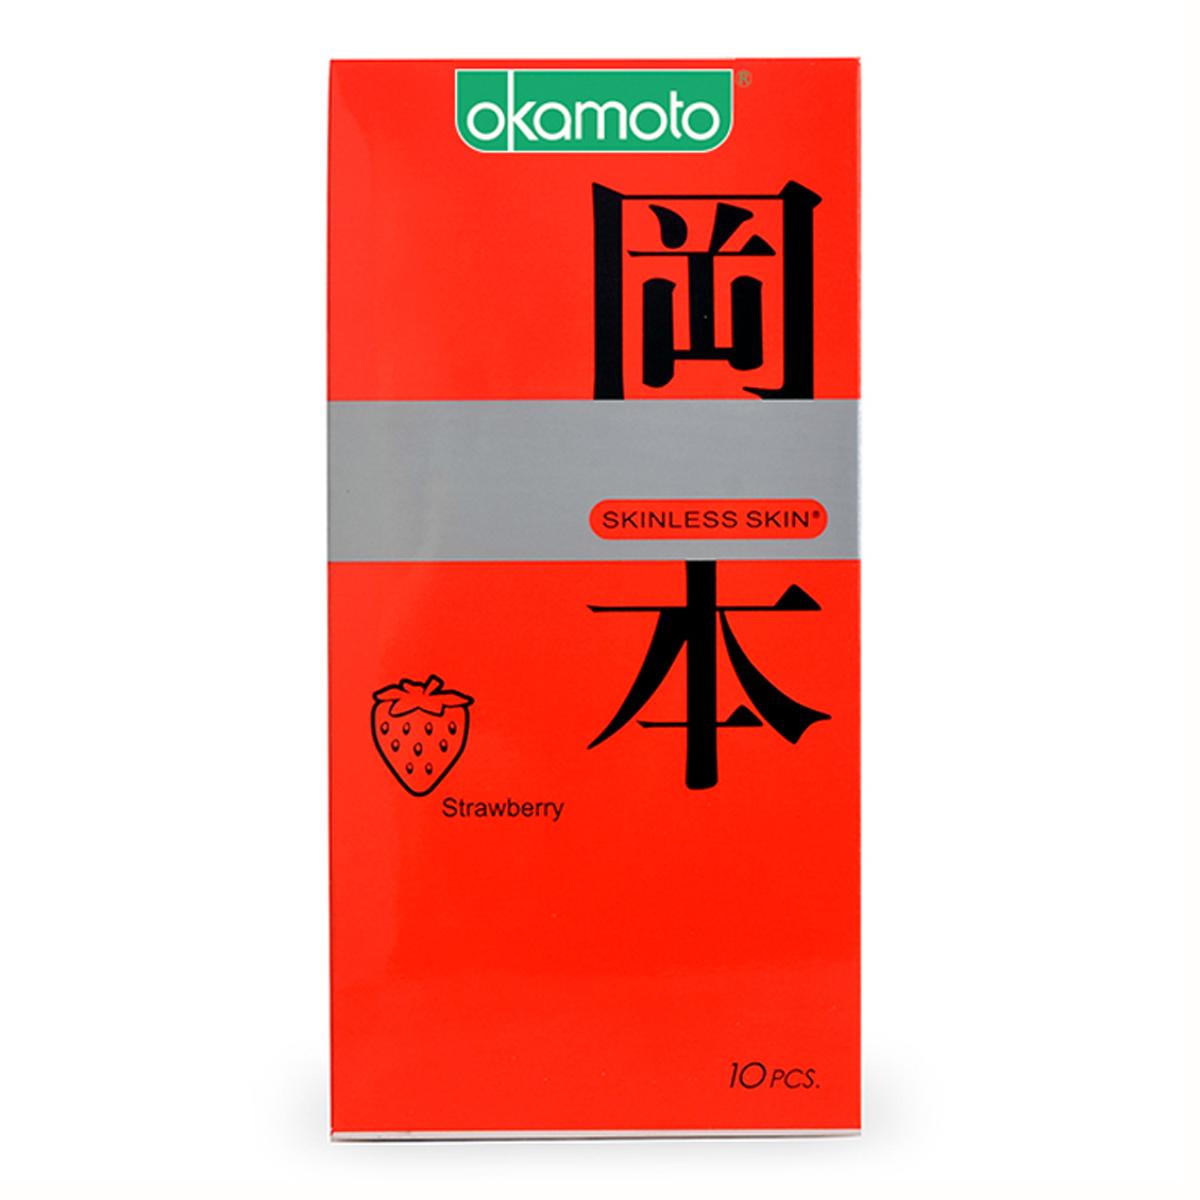 Combo 2 hộp BCS Okamoto Skinless Skin Strawberry Hương Dâu Hộp 10 Cái 1